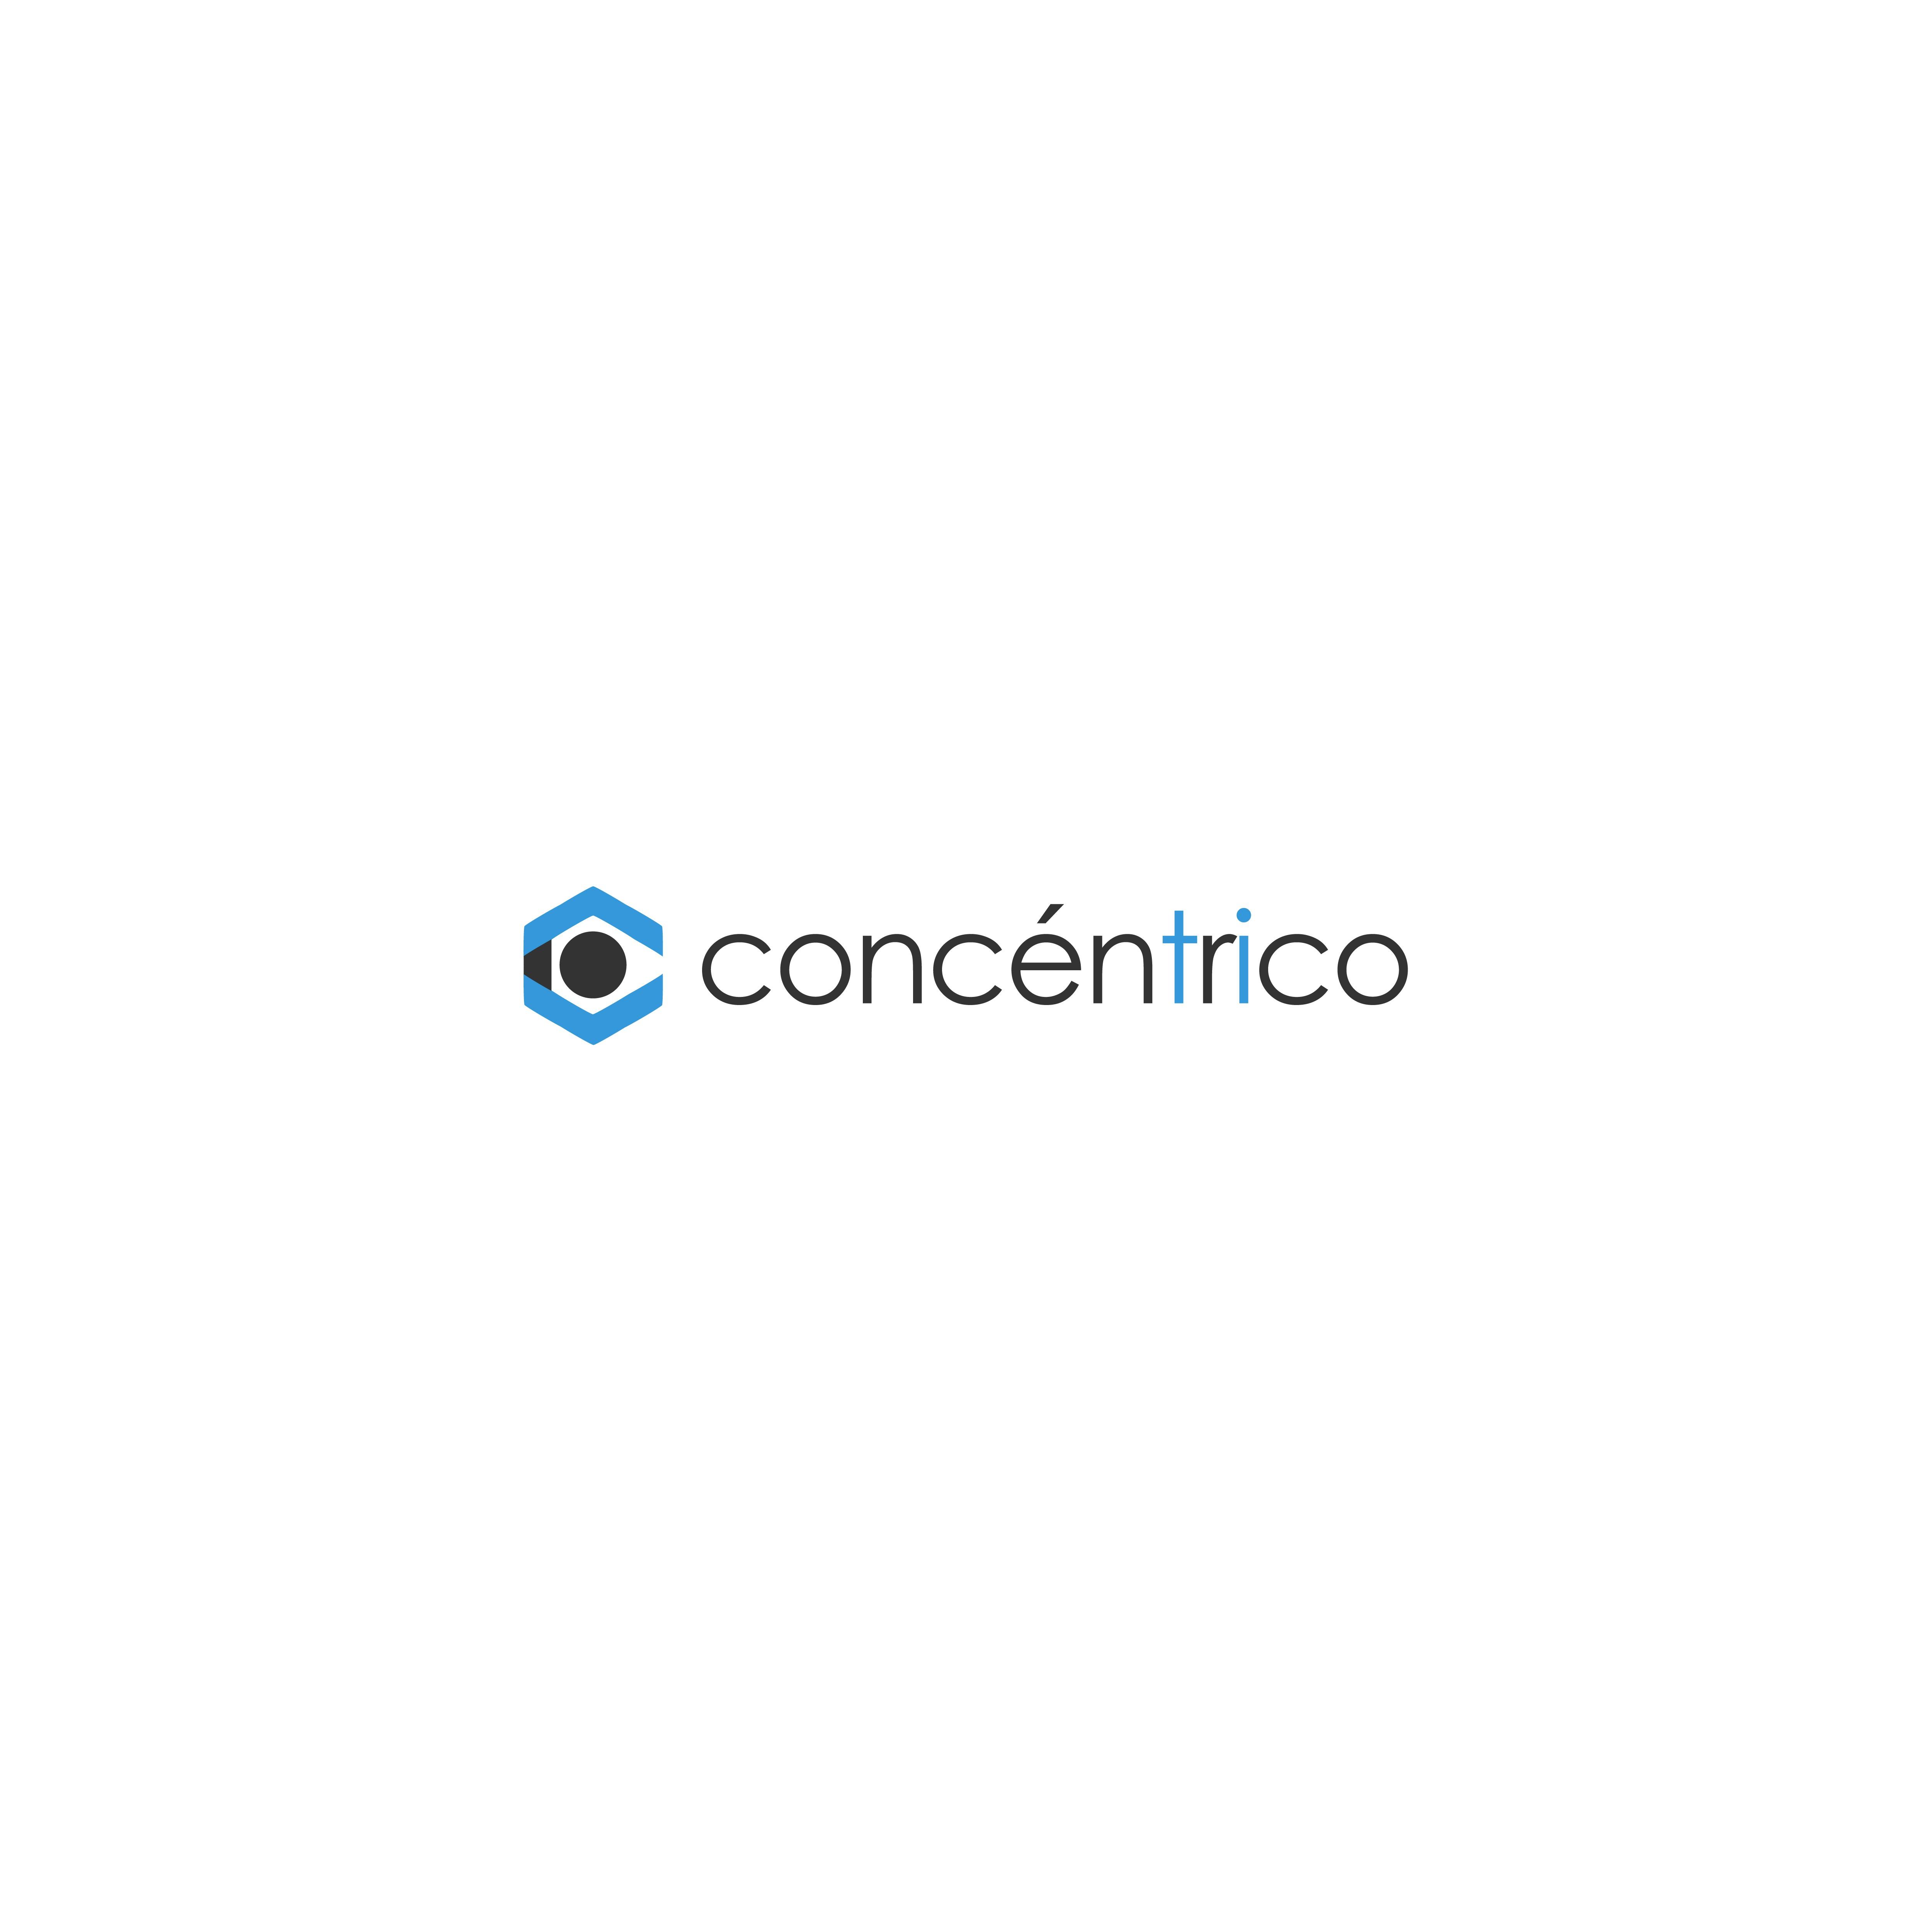 Create a logo for Concentrico, a software development company!